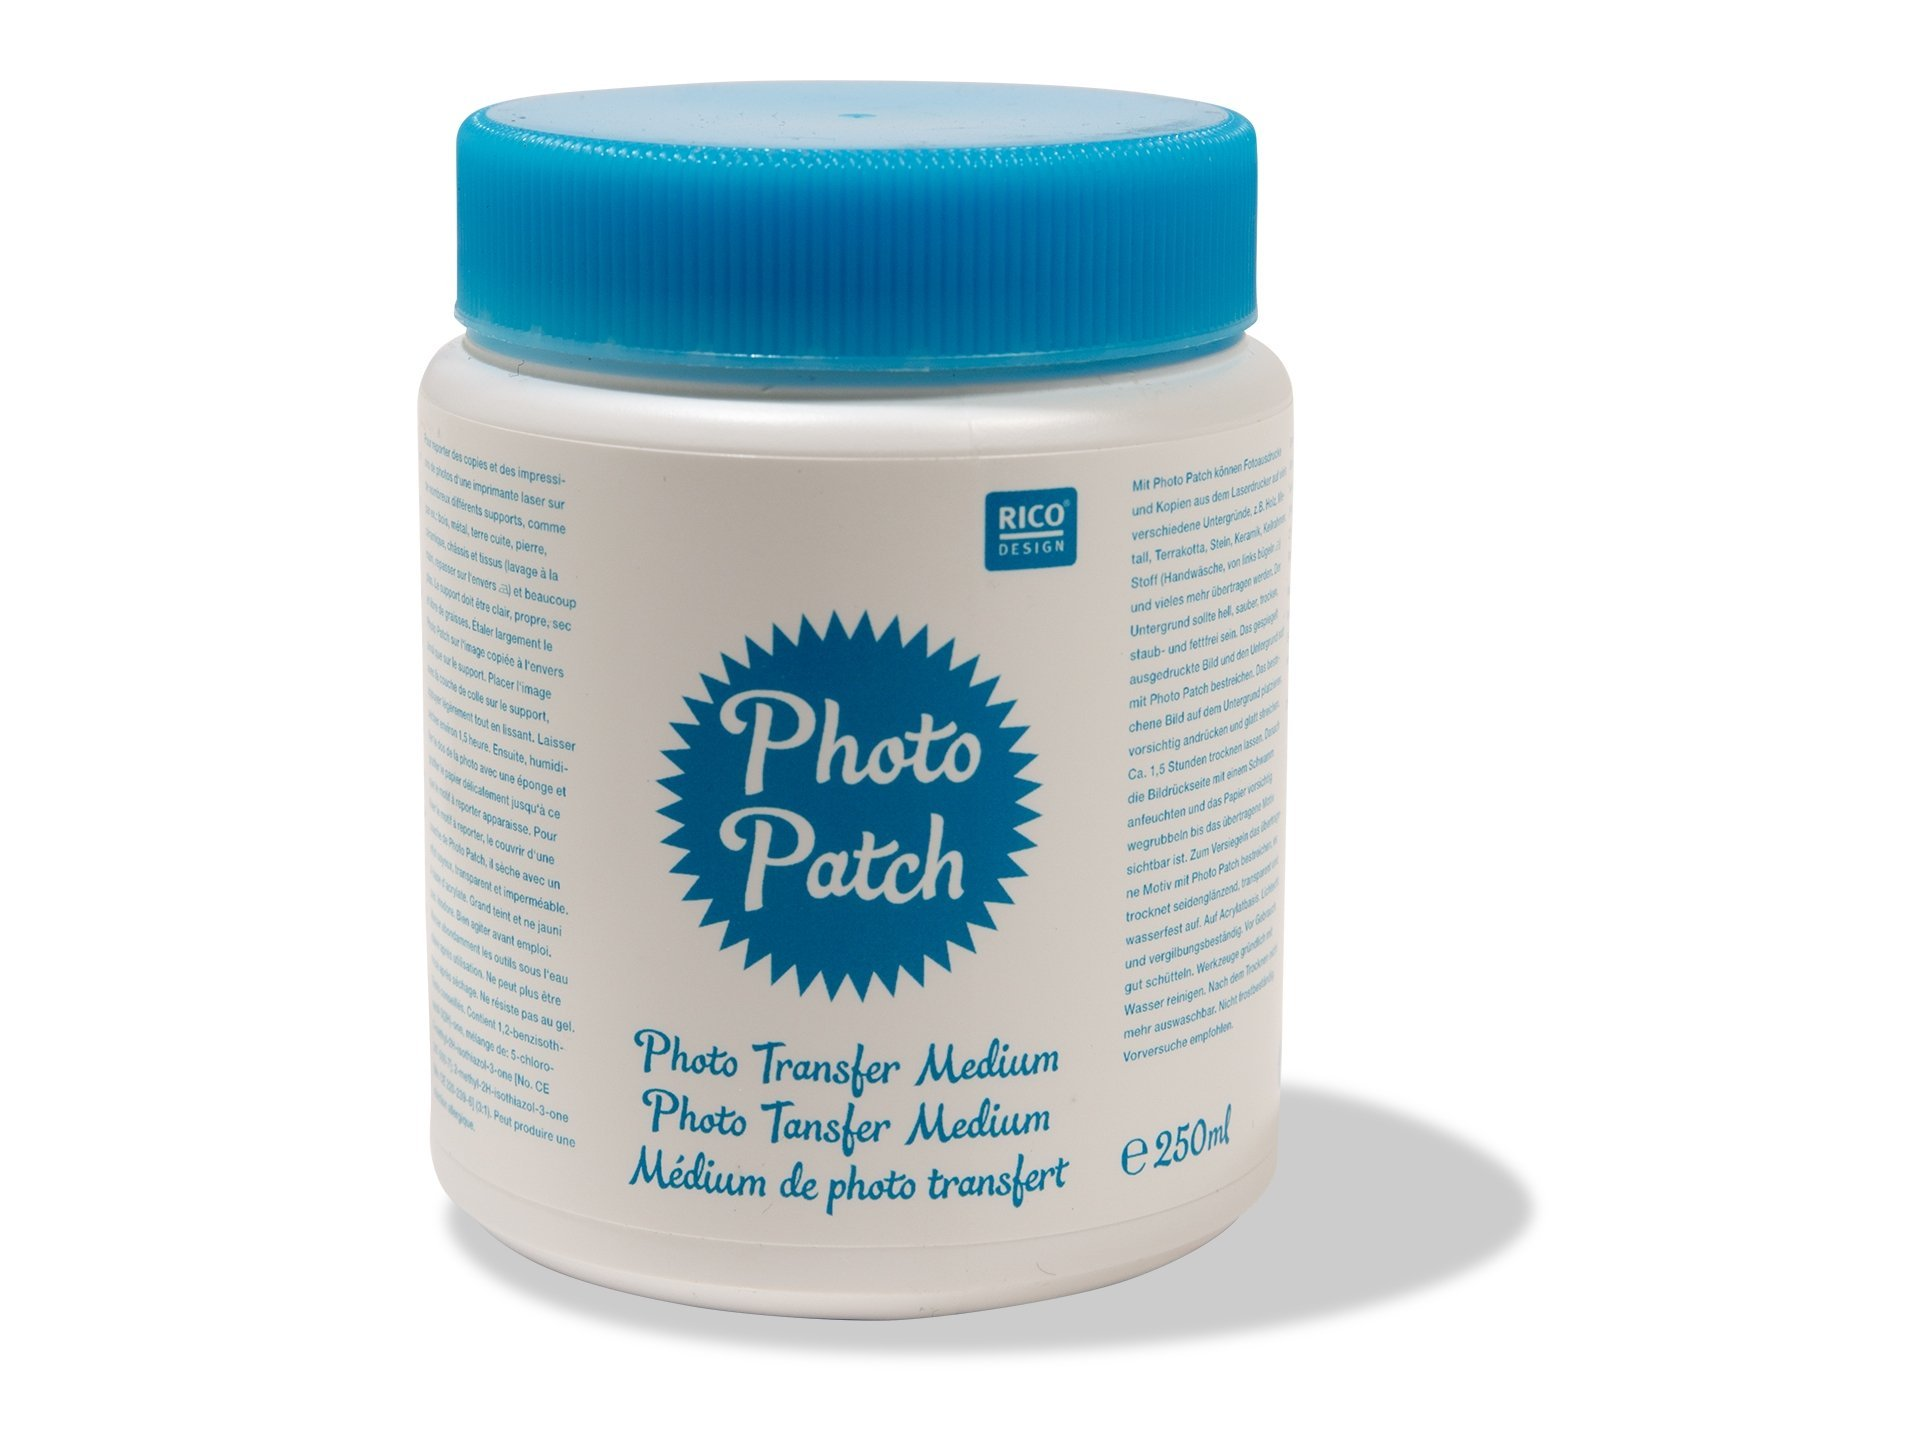 Photo Patch, Photo Transfer Medium